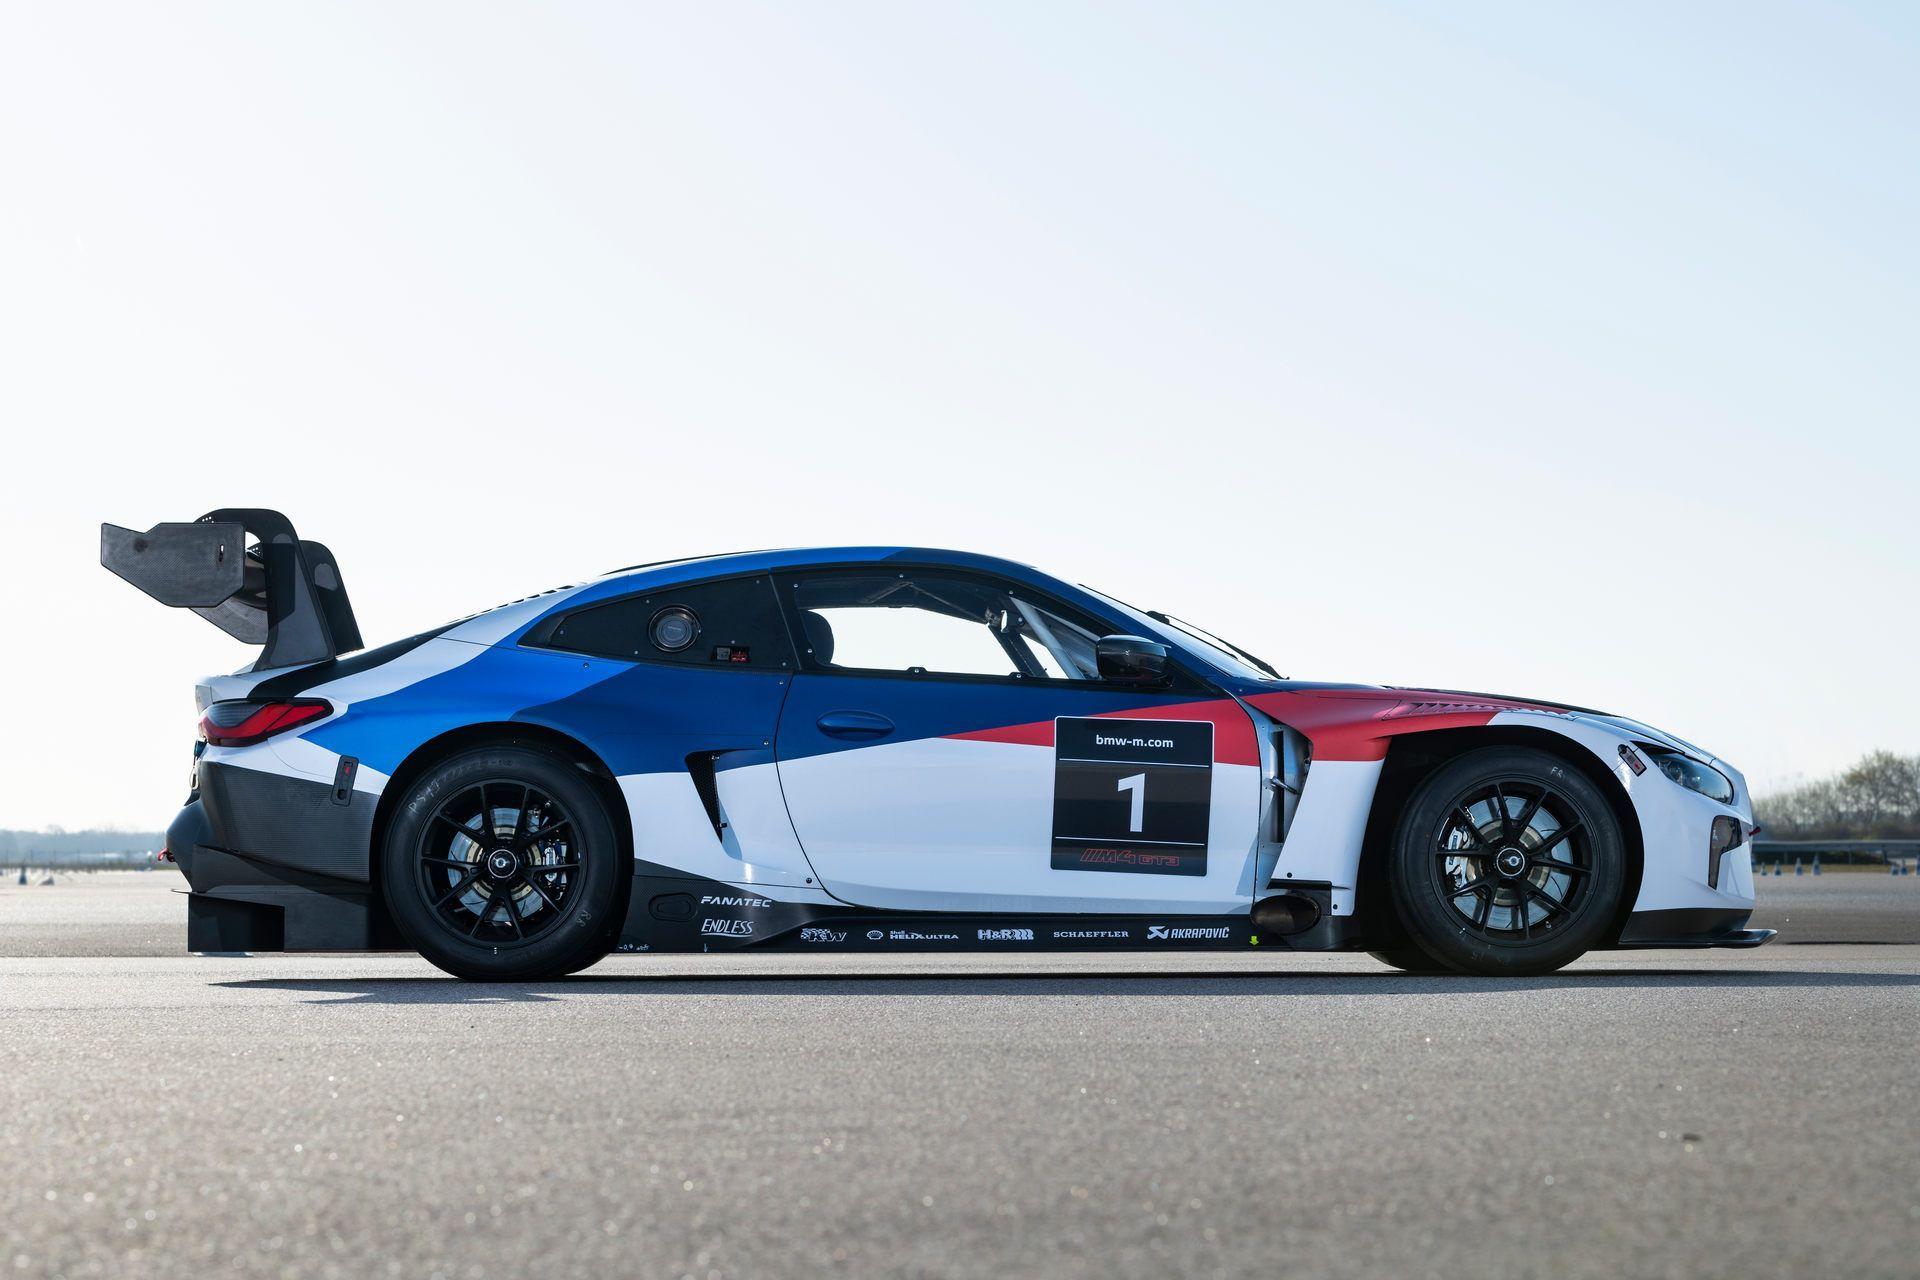 BMW-M4-GT3-17